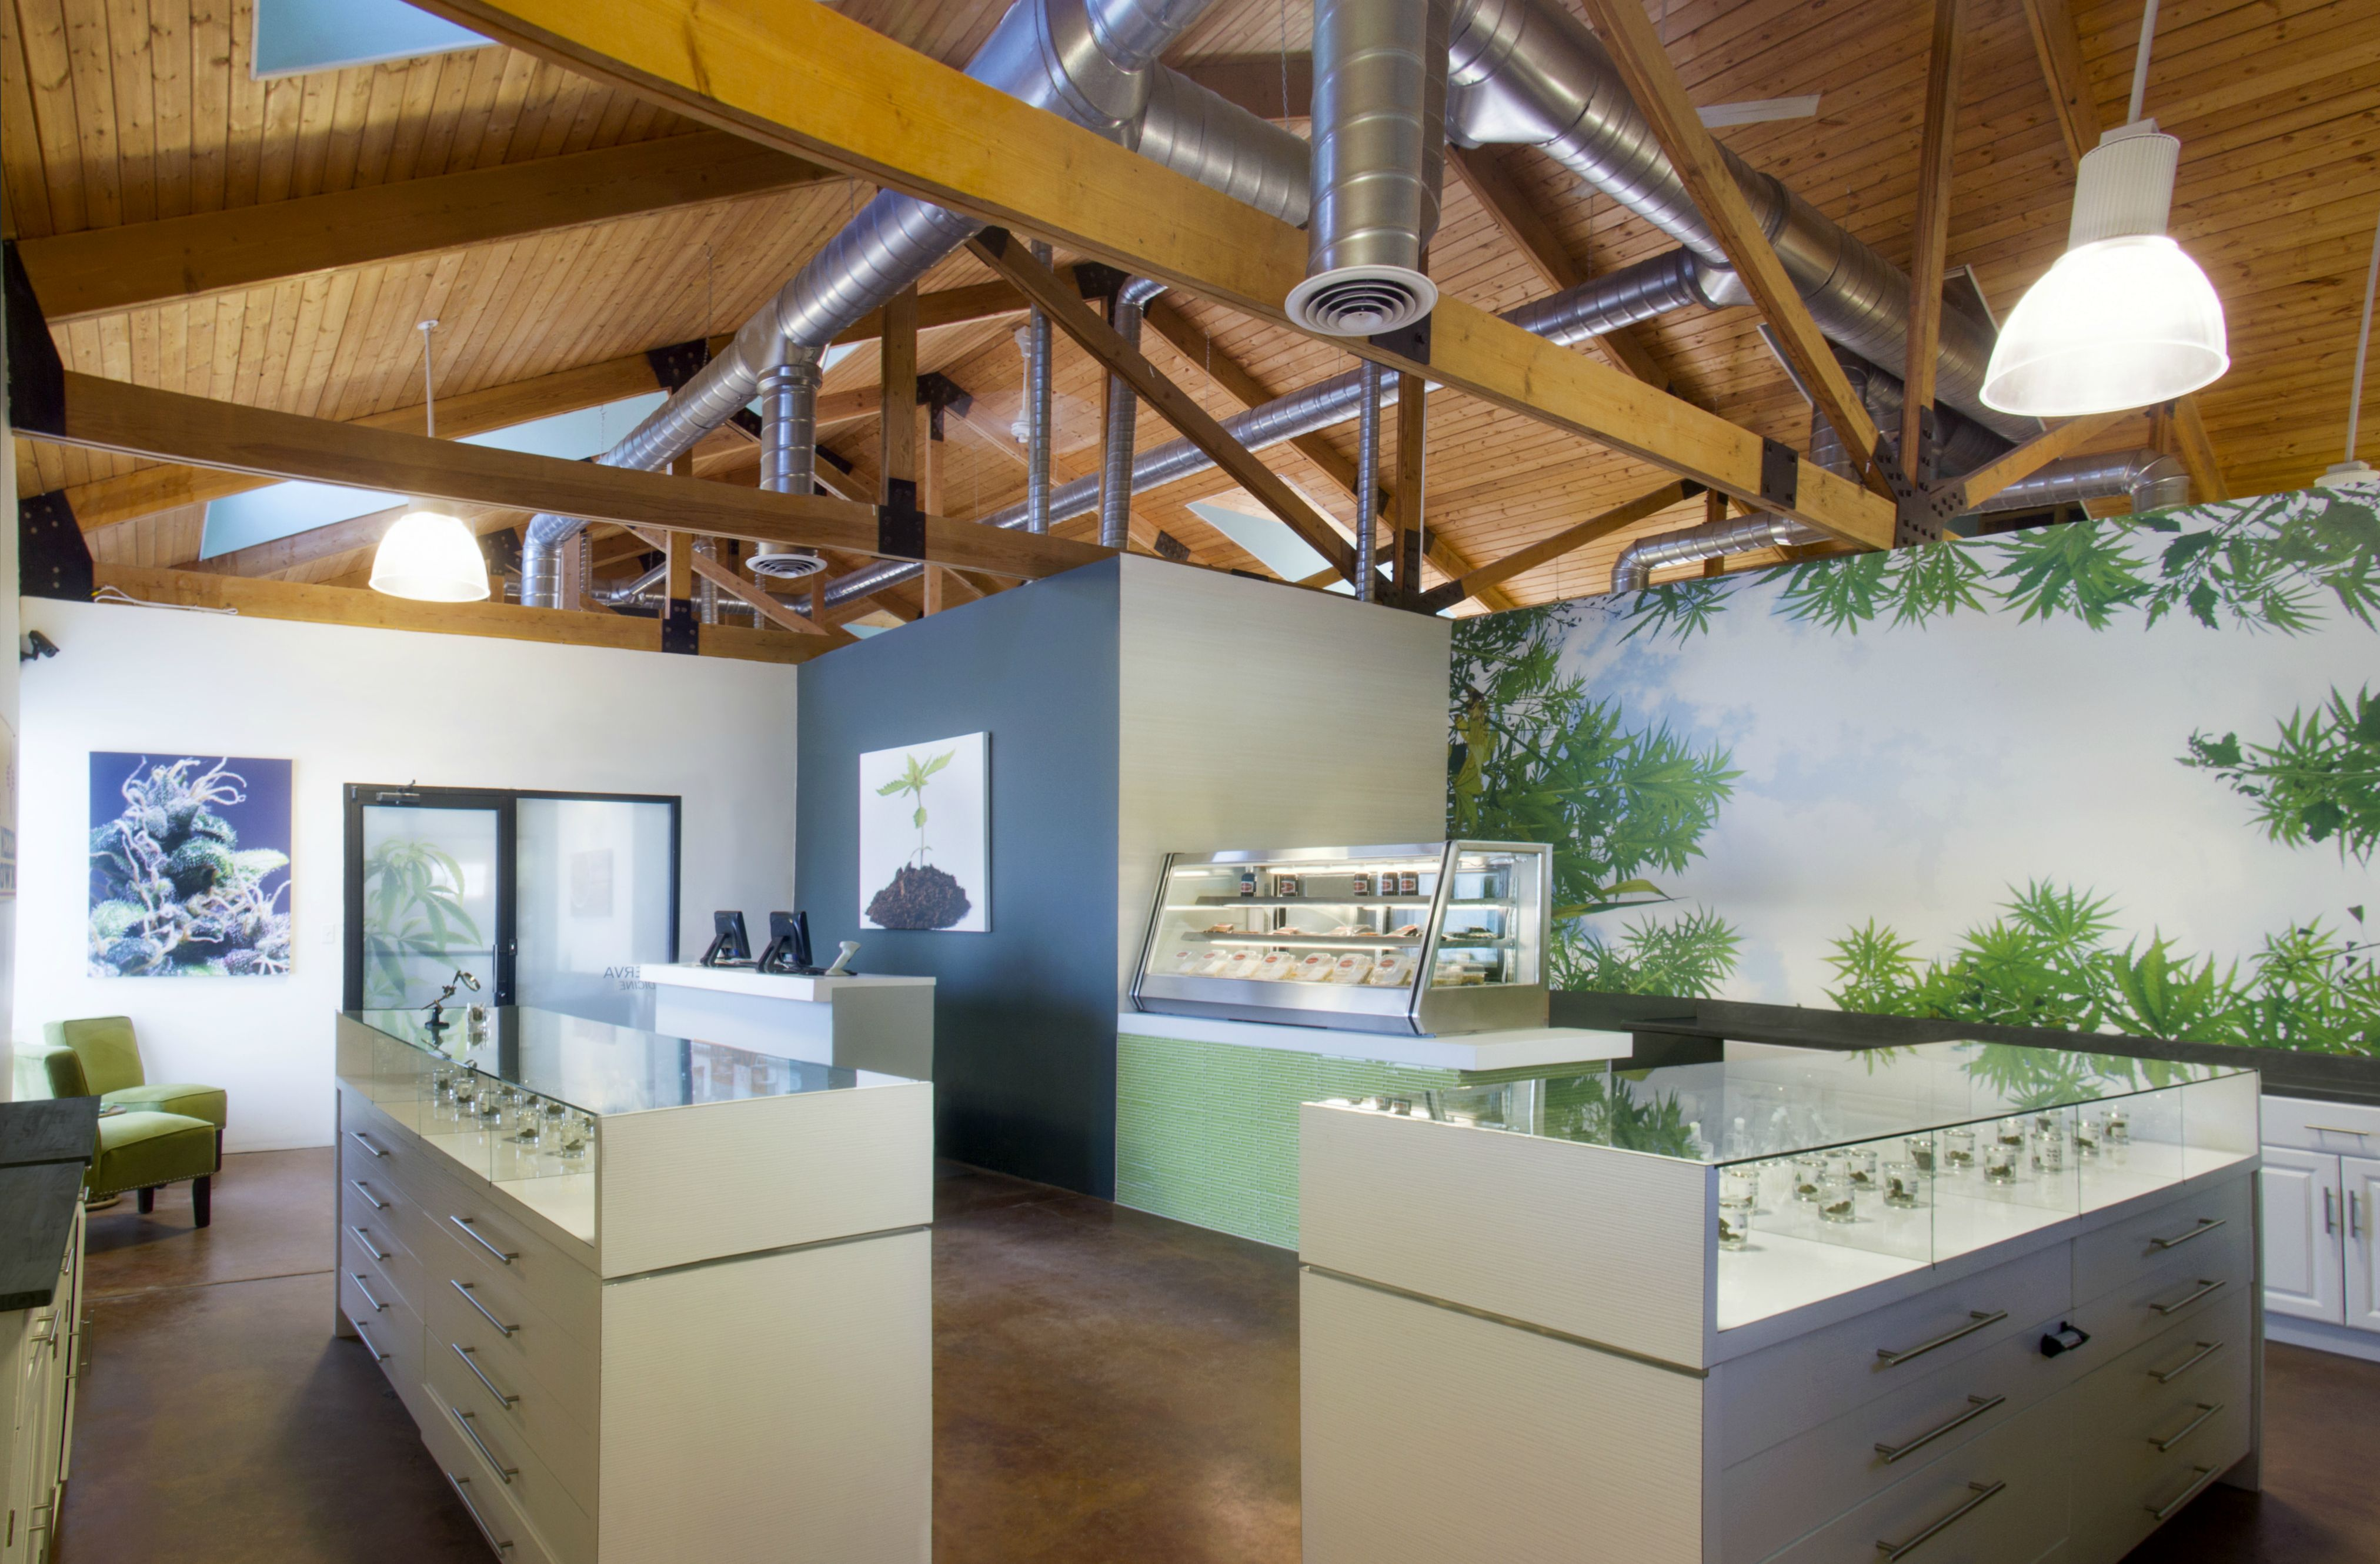 These 10 Marijuana Dispensaries Break Stereotypes With High Design